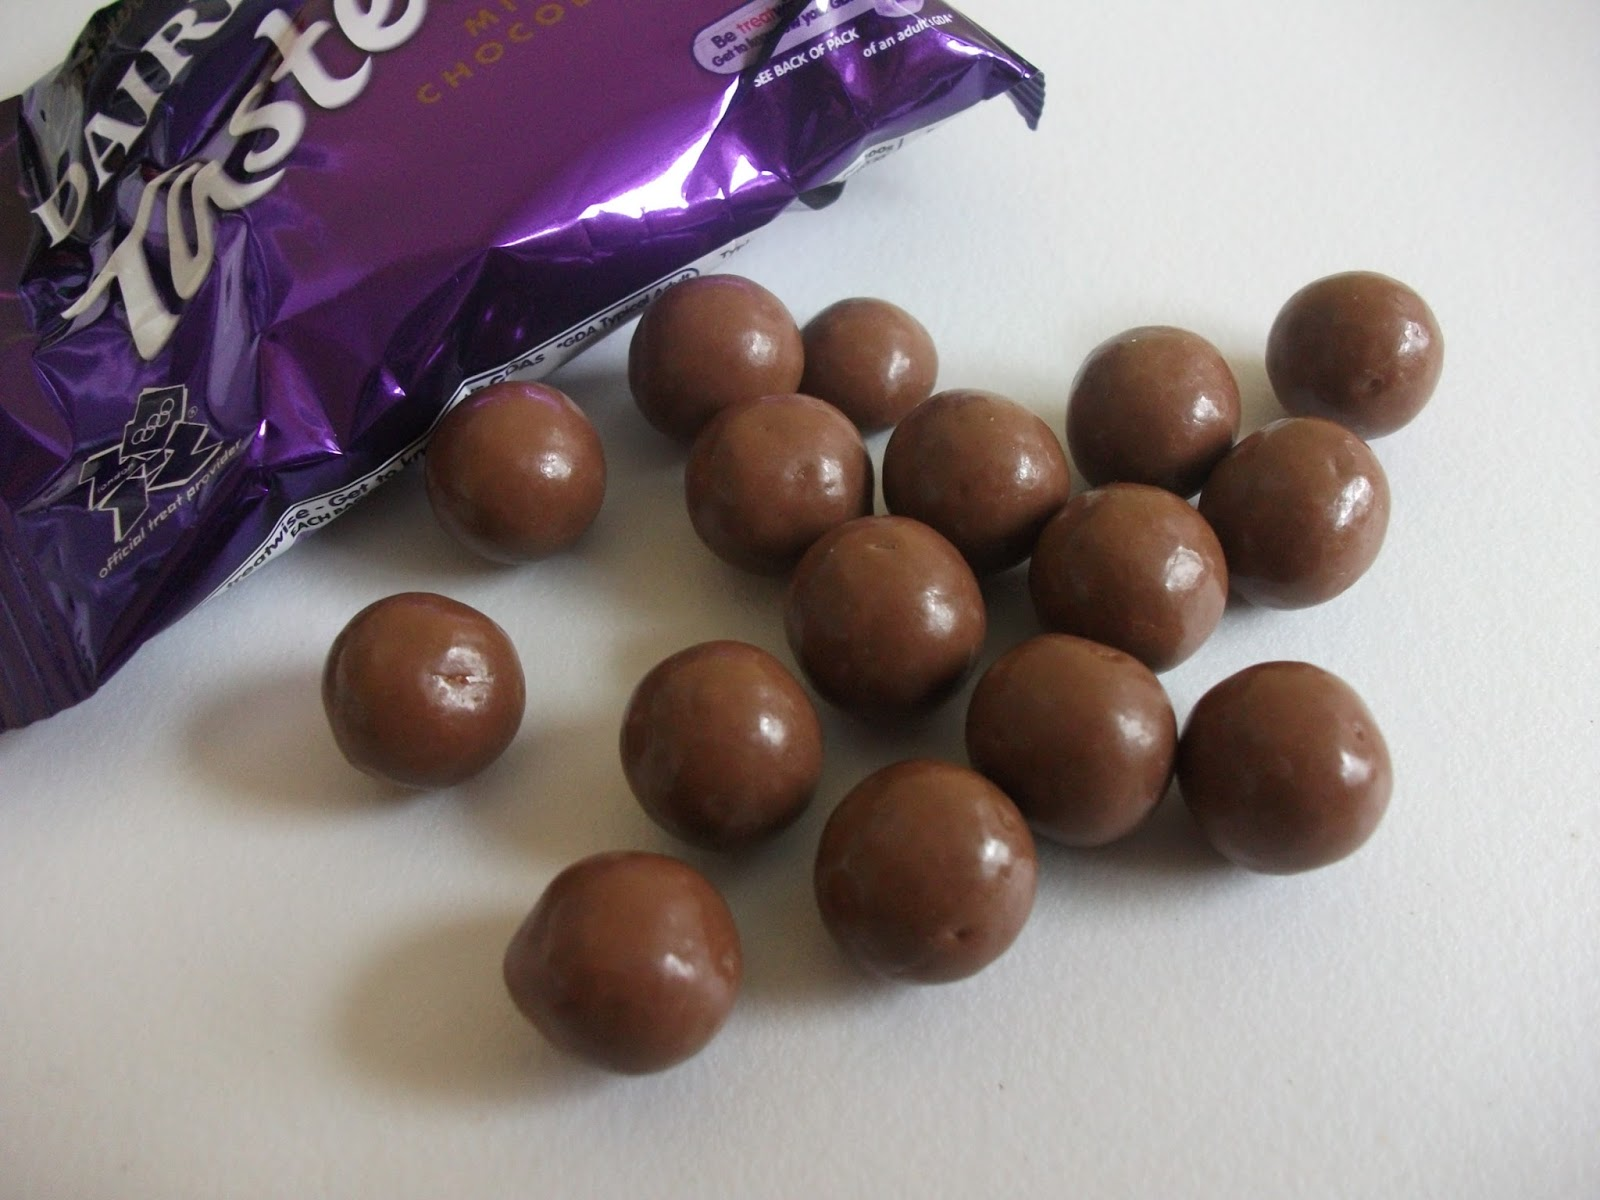 Cadbury Dark Milk Chocolate Review